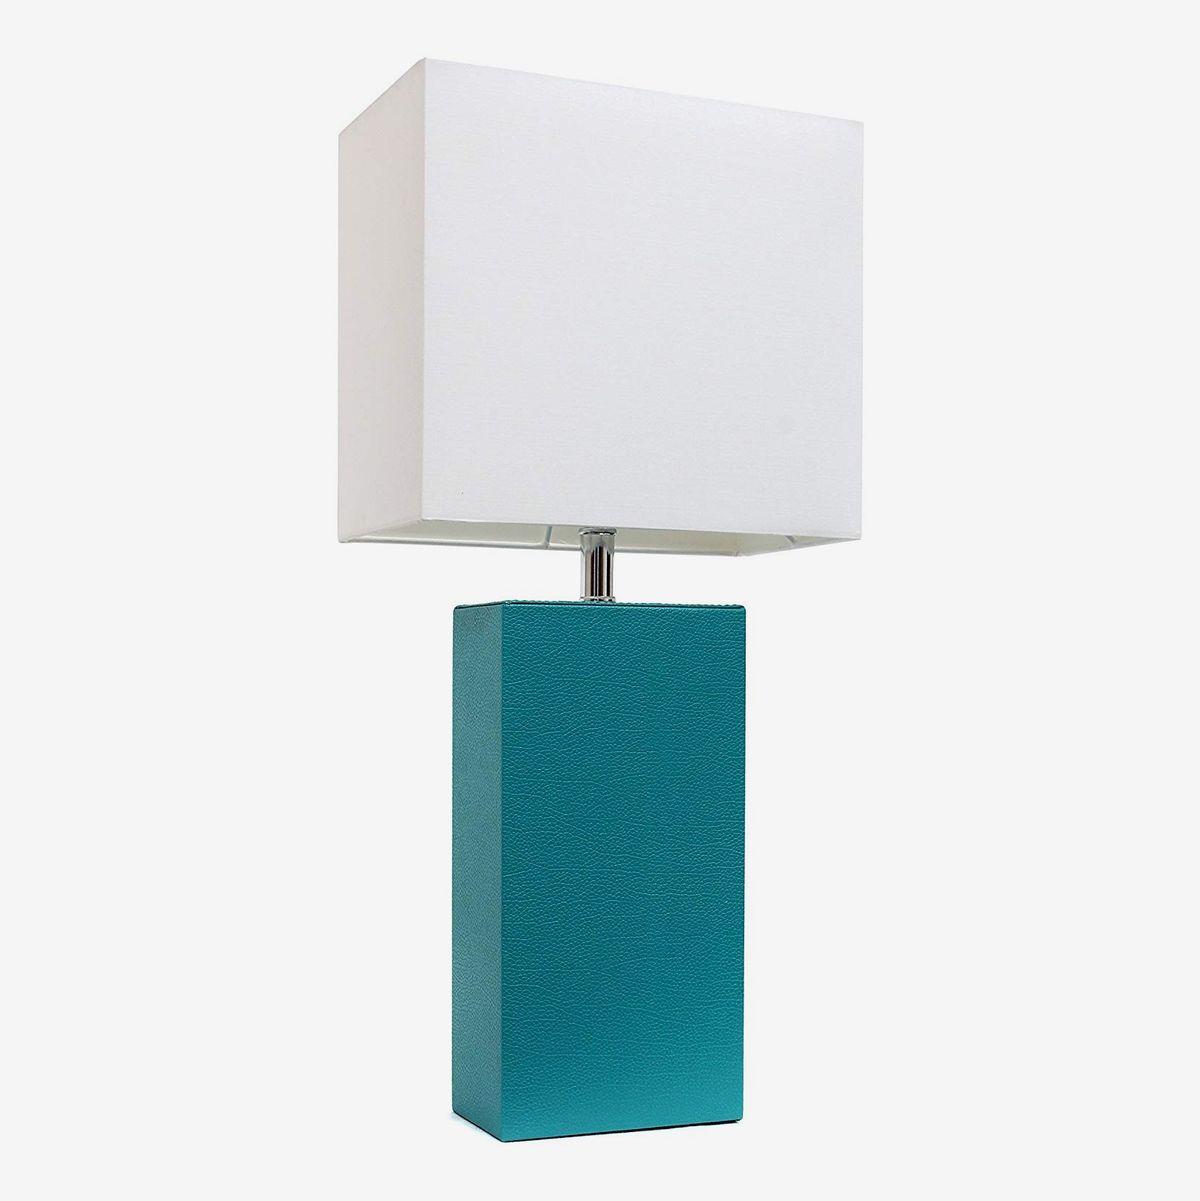 23 Best Bedside Lamps 2020 The Strategist New York Magazine